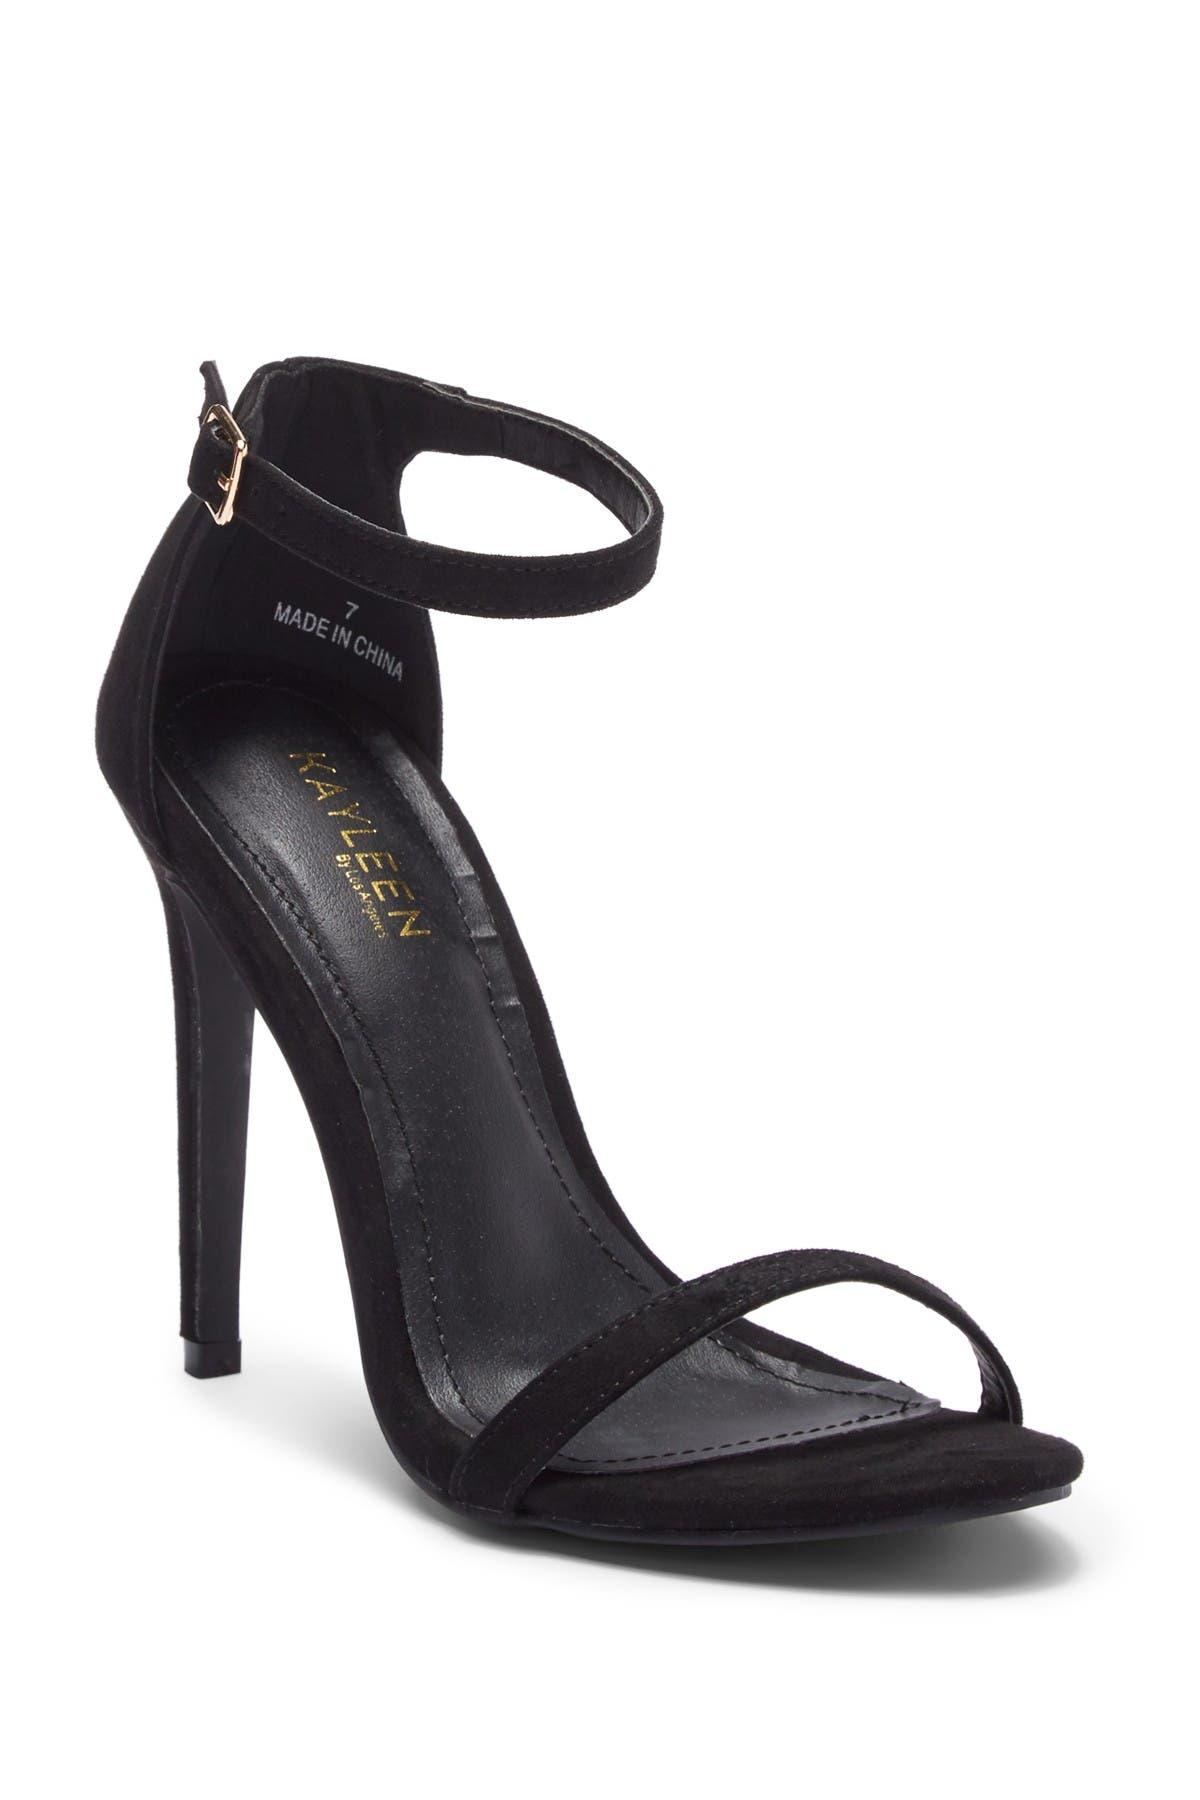 Image of Elegant Footwear Tobi Ankle Strap Stiletto